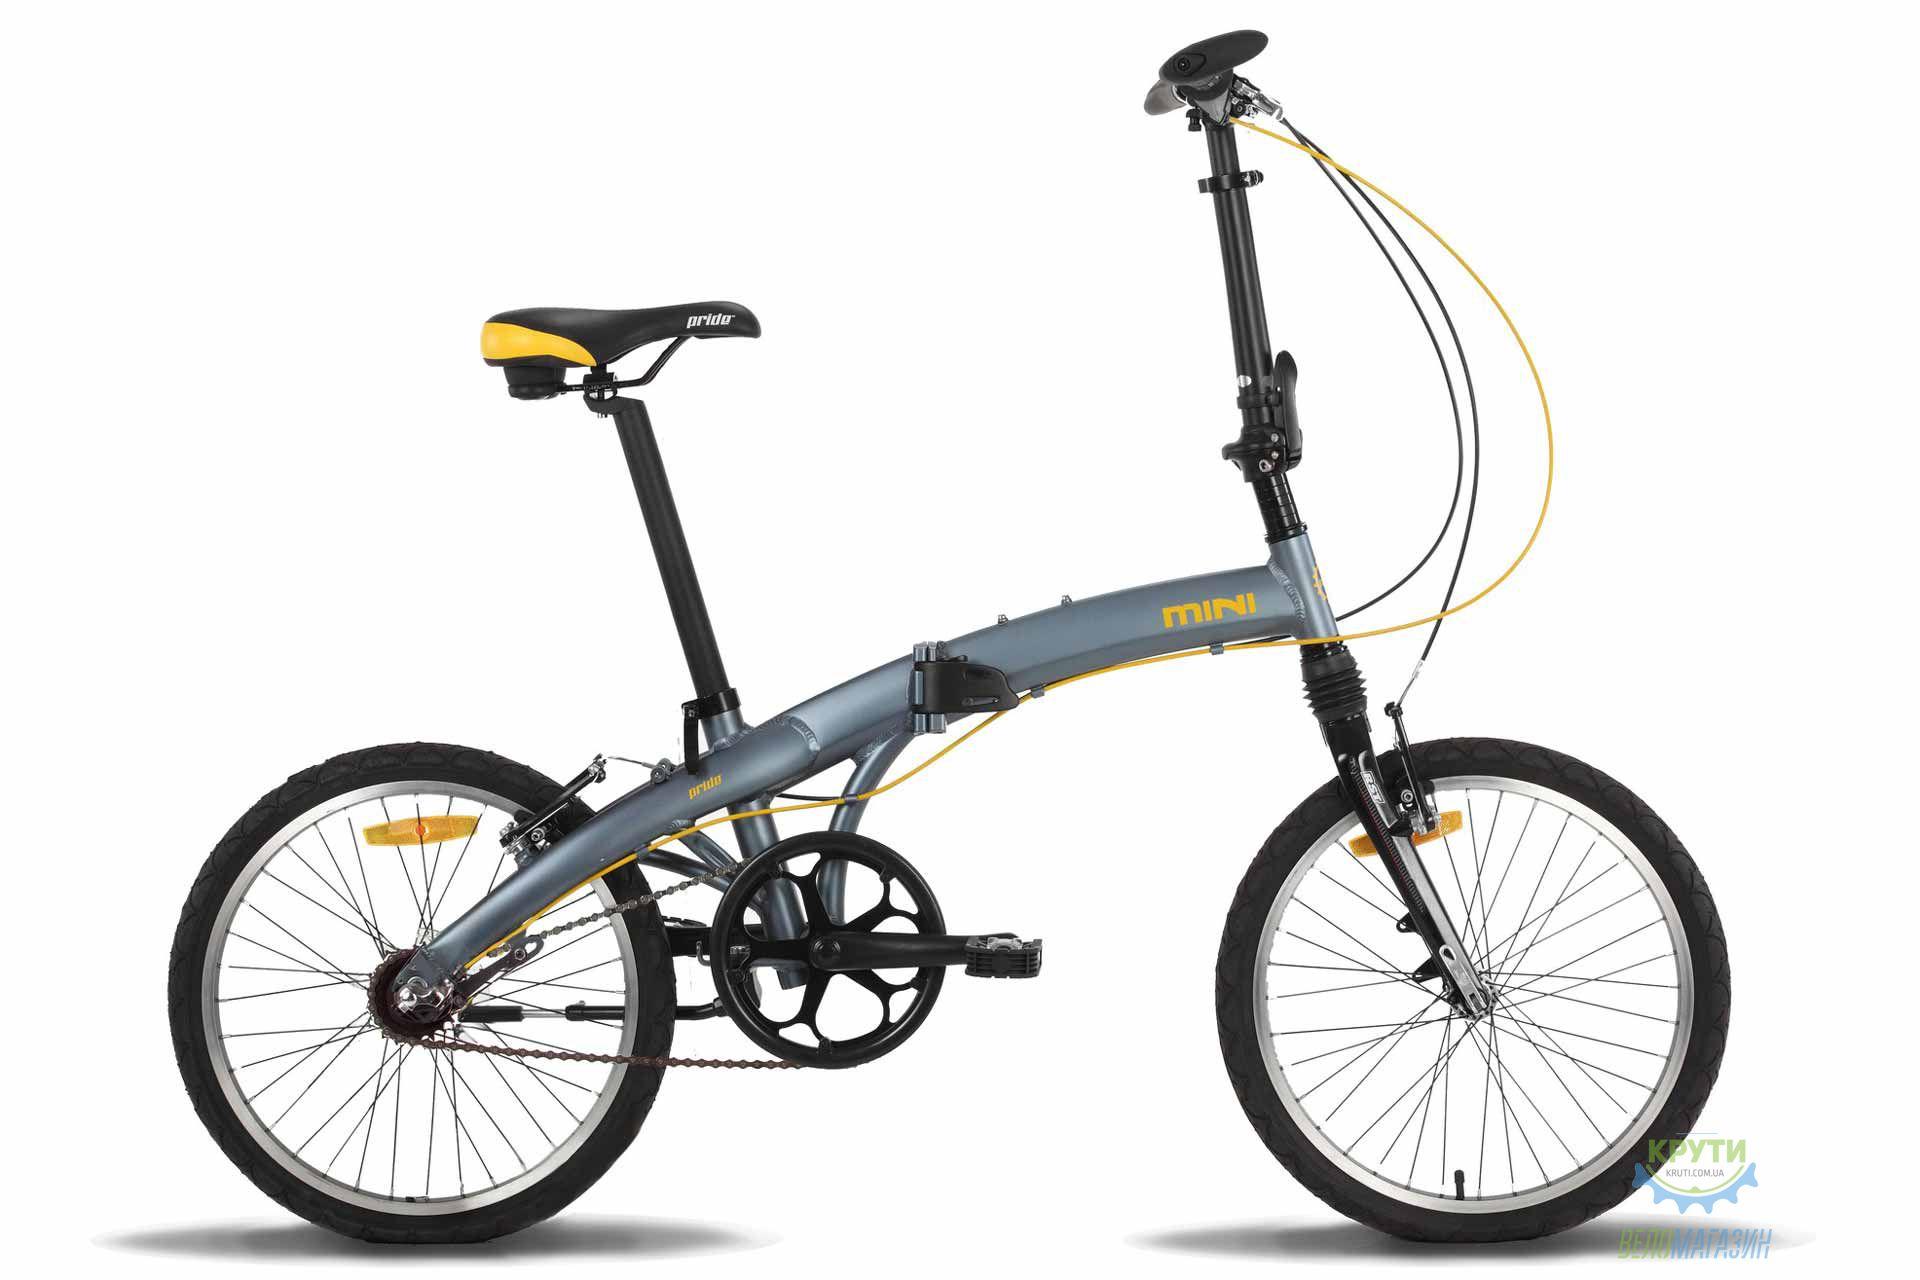 Велосипед 20'' PRIDE MINI 3sp RST серо-оранжевый 2016